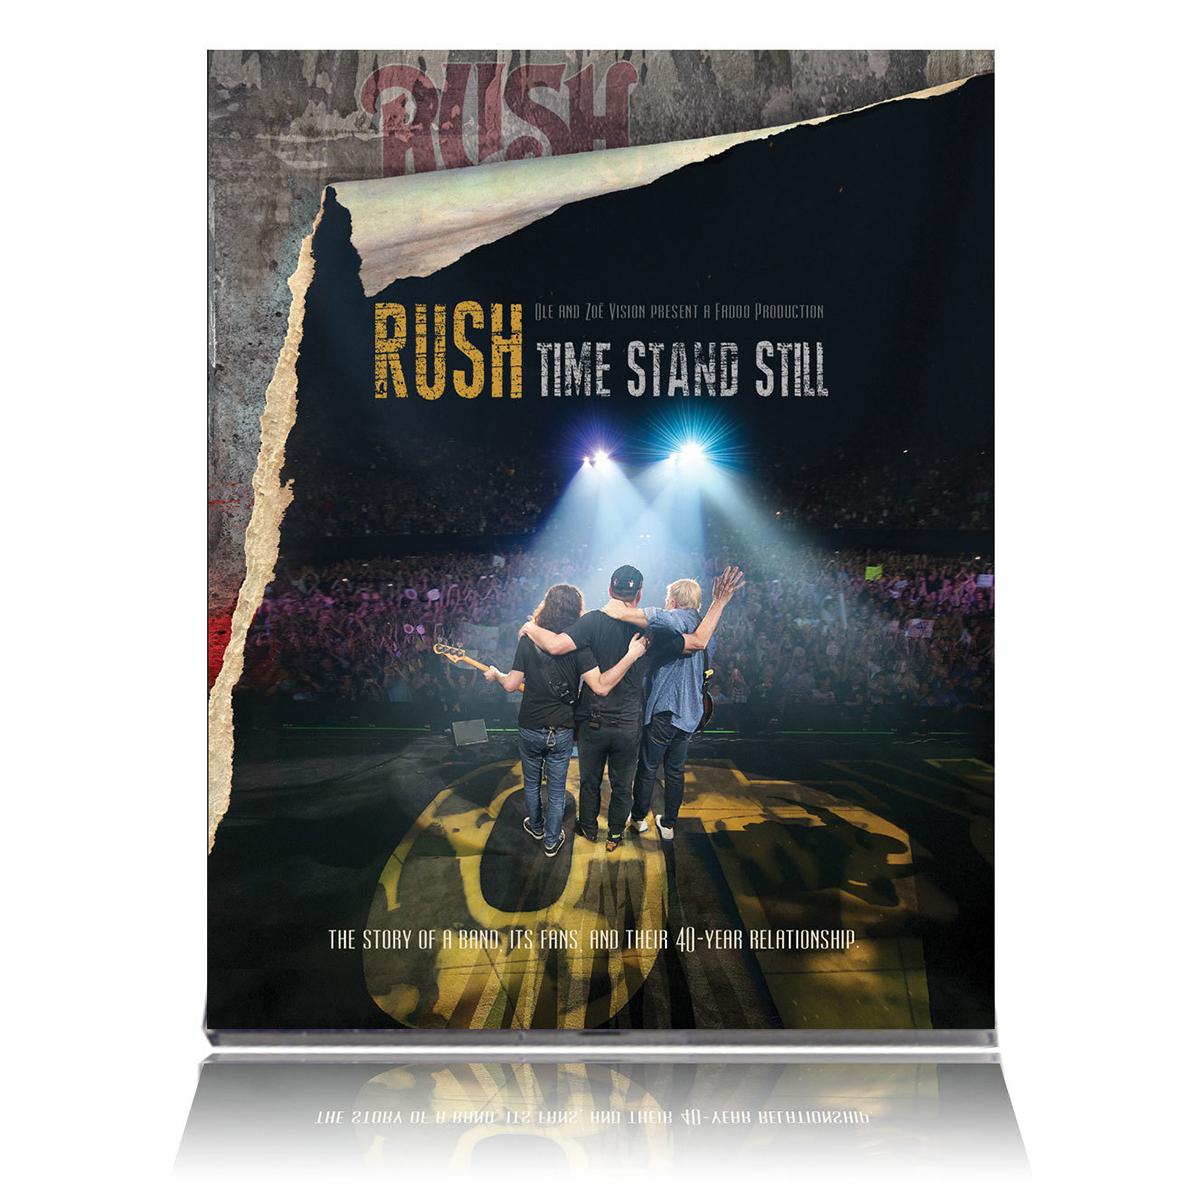 Rush Time Stand Still Blu-Ray